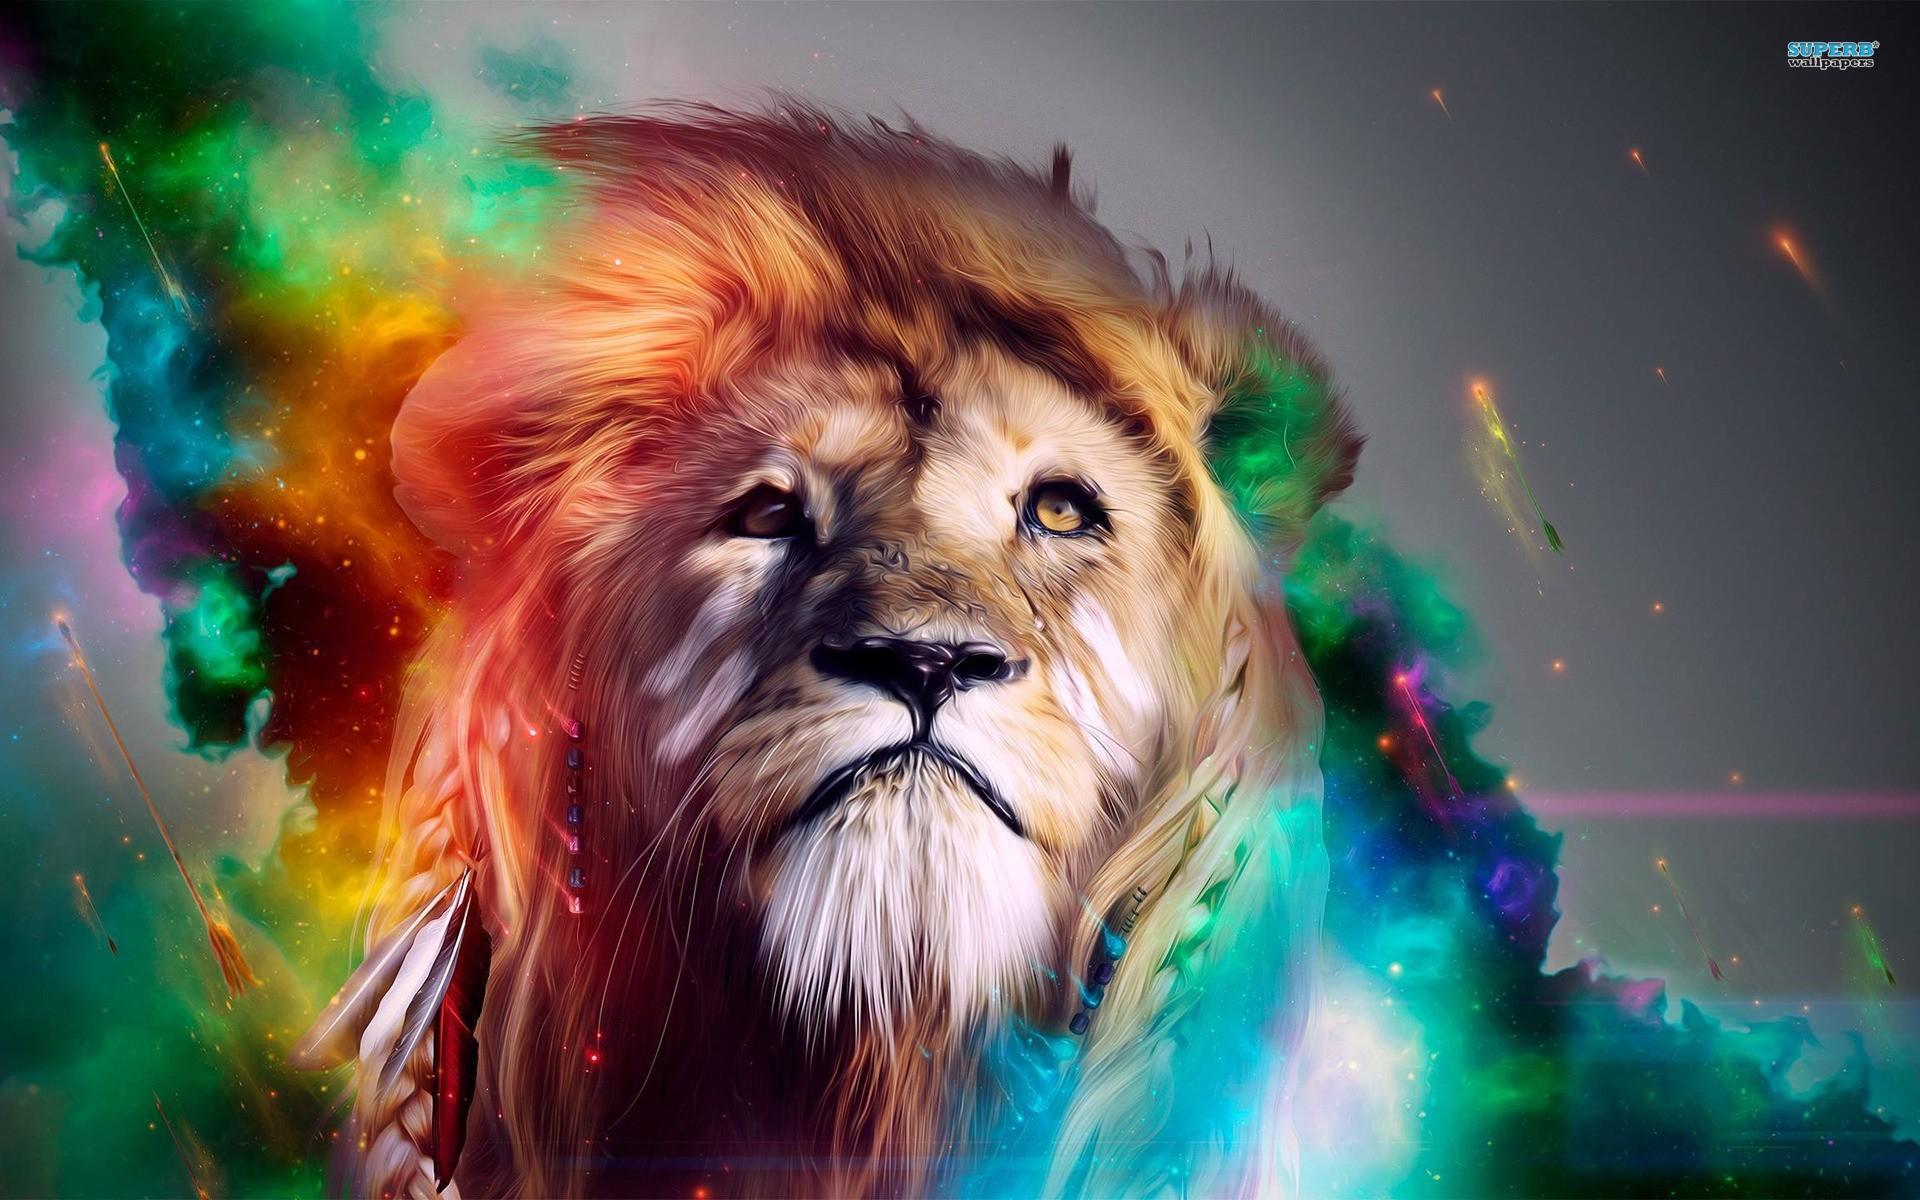 Colorized Lion Digital Art Hd Wallpaper X   Src Download - 4k Wallpaper Lion - HD Wallpaper